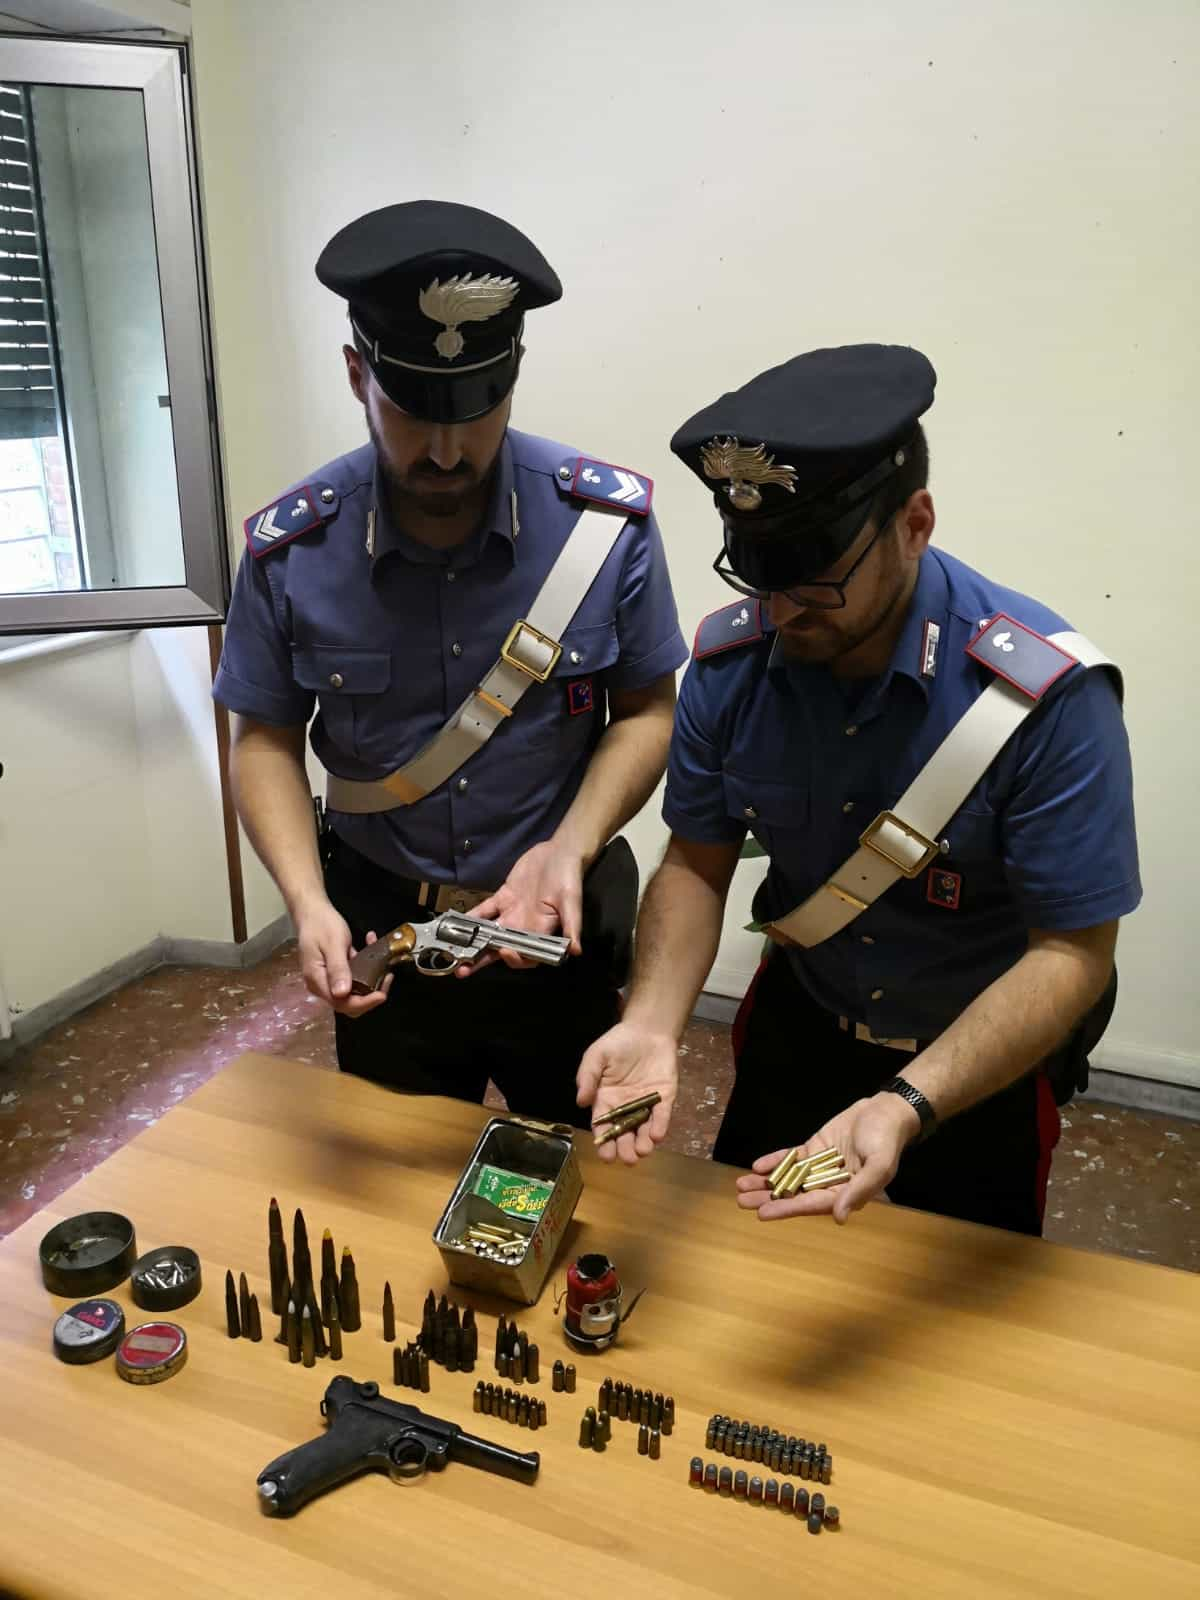 Le armi sequestrate dai Carabinieri (1) (1)-2